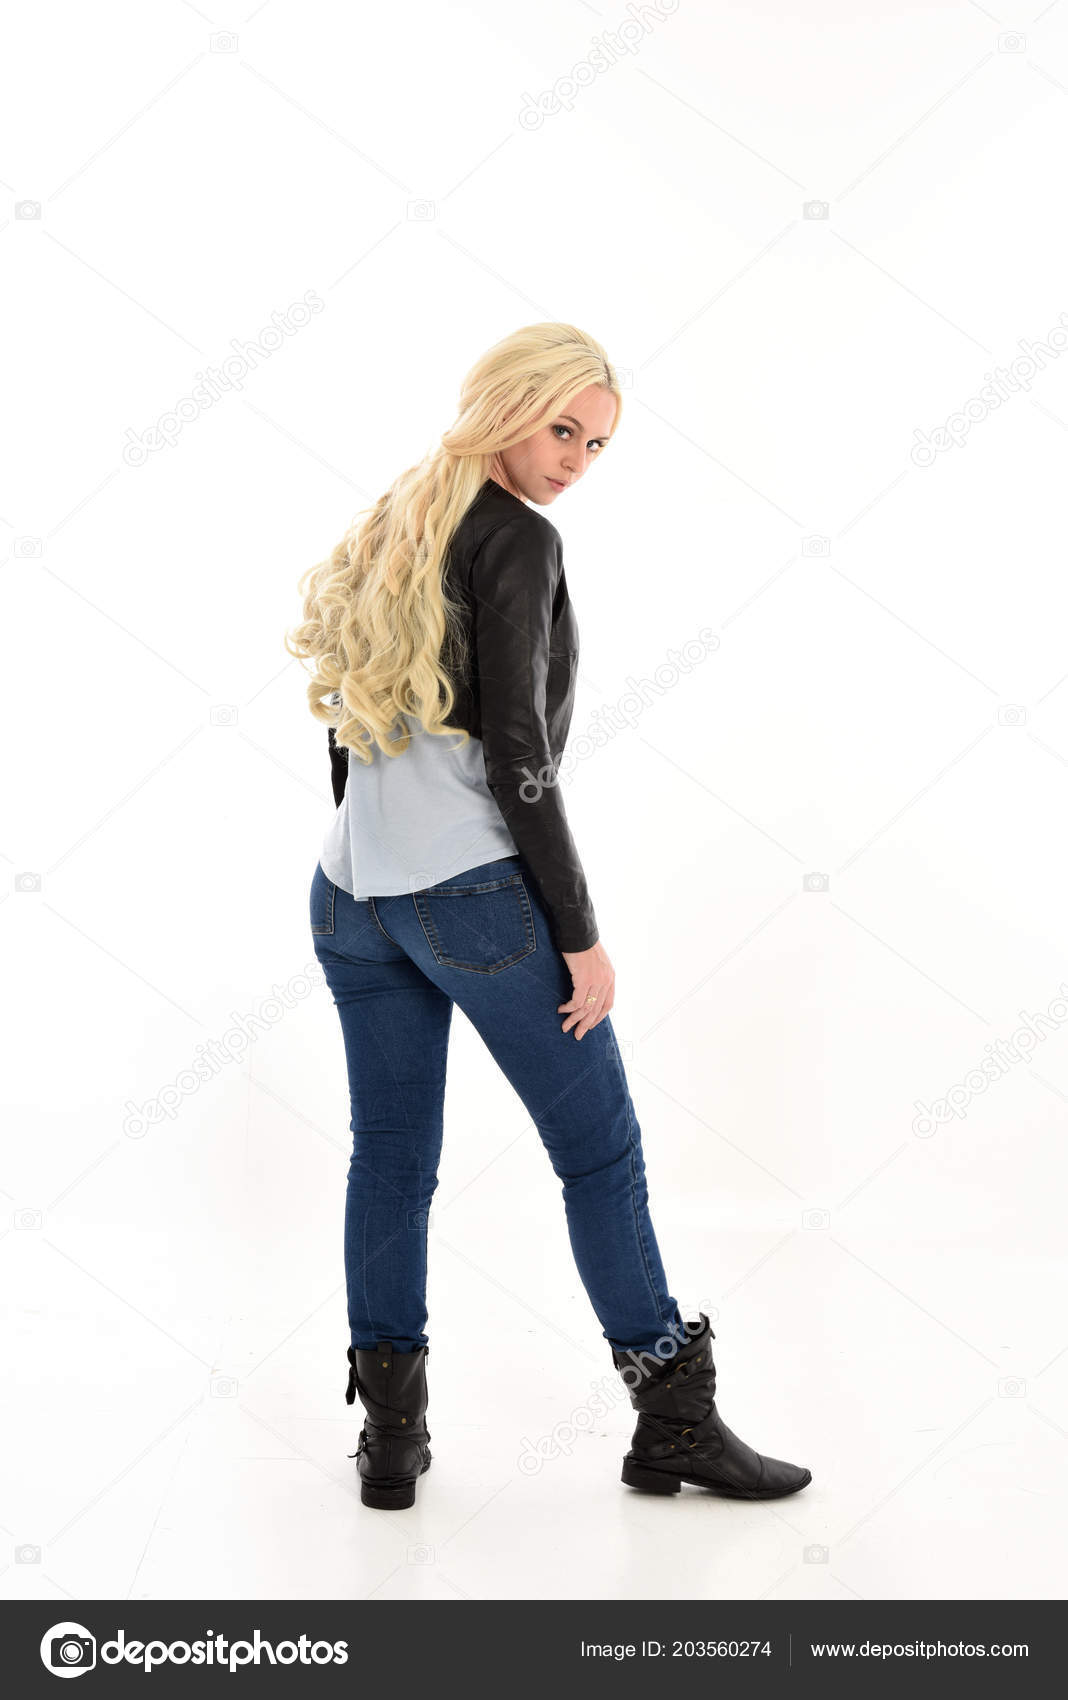 Jeans Chaqueta Longitud Sencillos Muchacha Completa Con Retrato xfqUHH